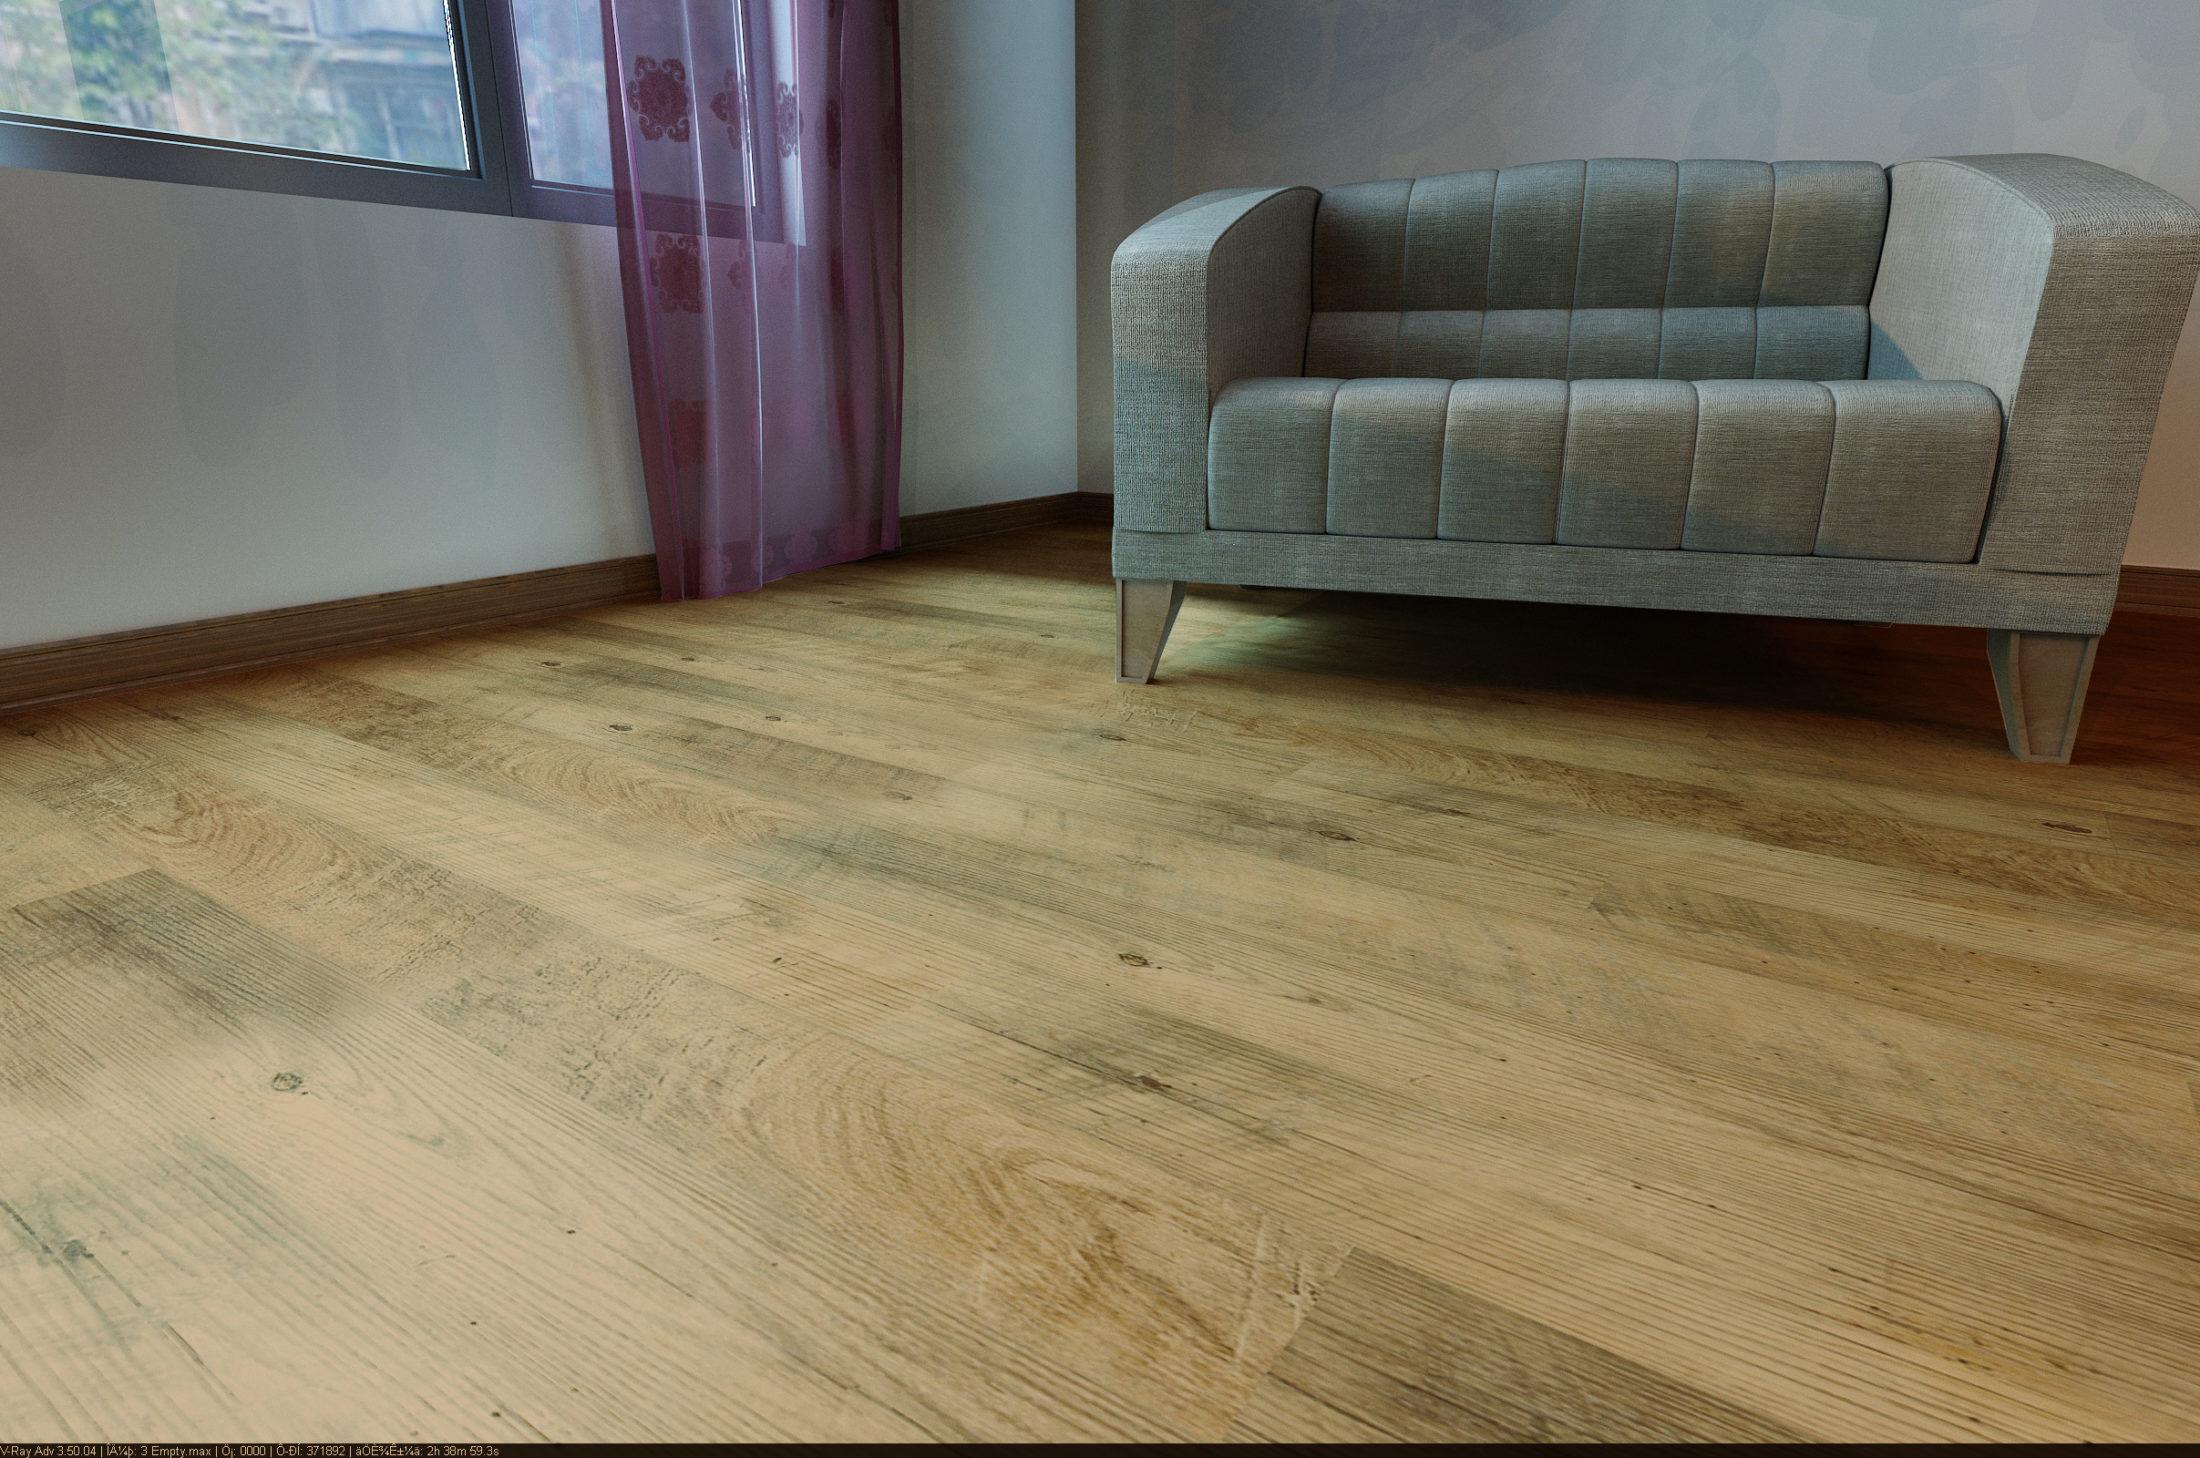 Adura max luxury vinyl plank sand max031 6 x 48 schillings for Max floor